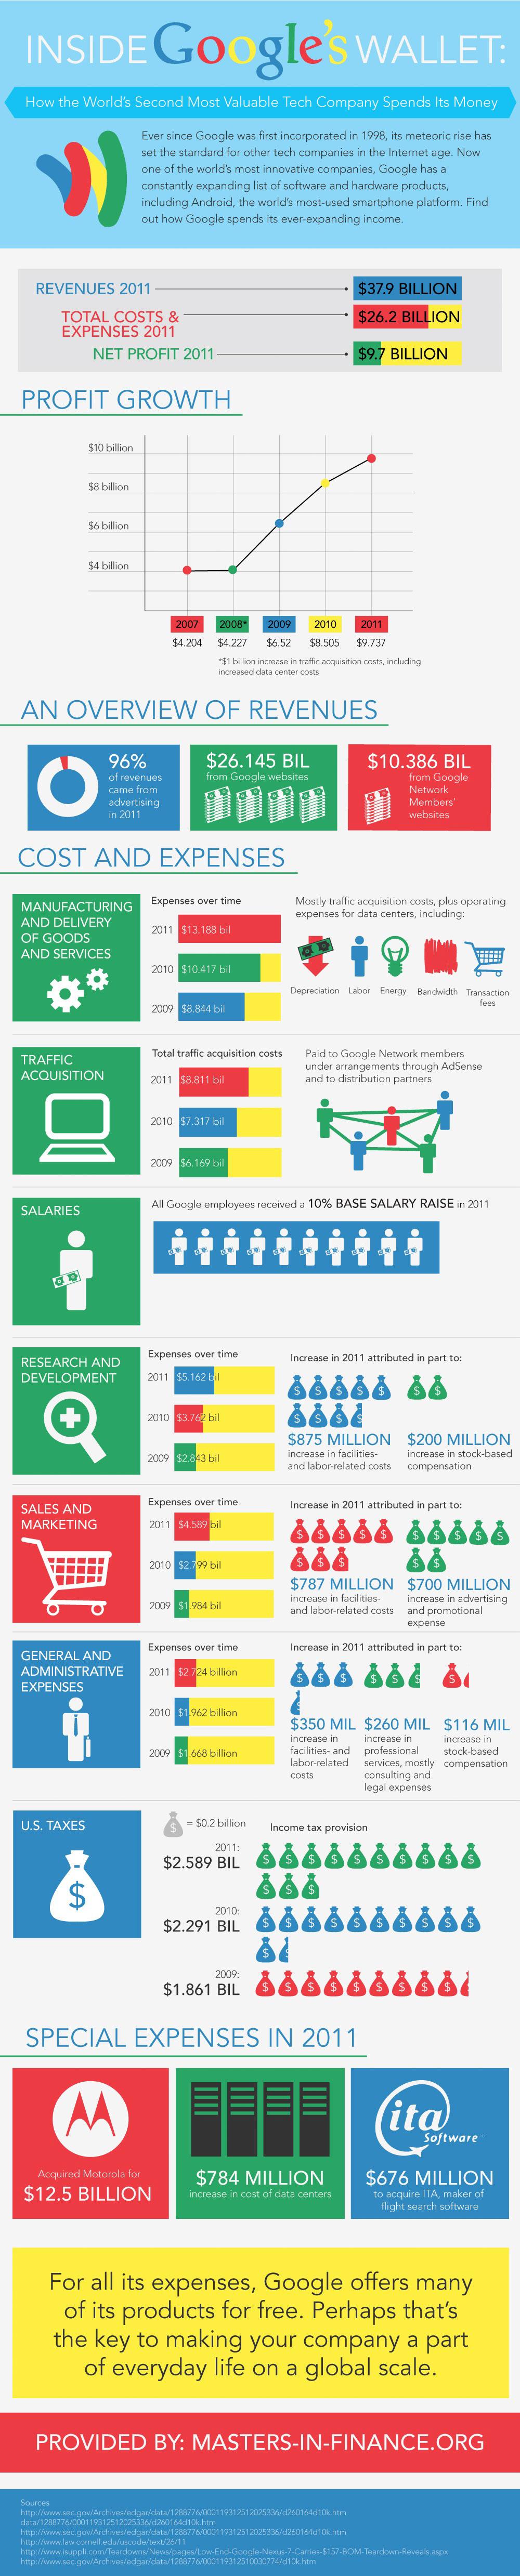 Google Finance-Infographic